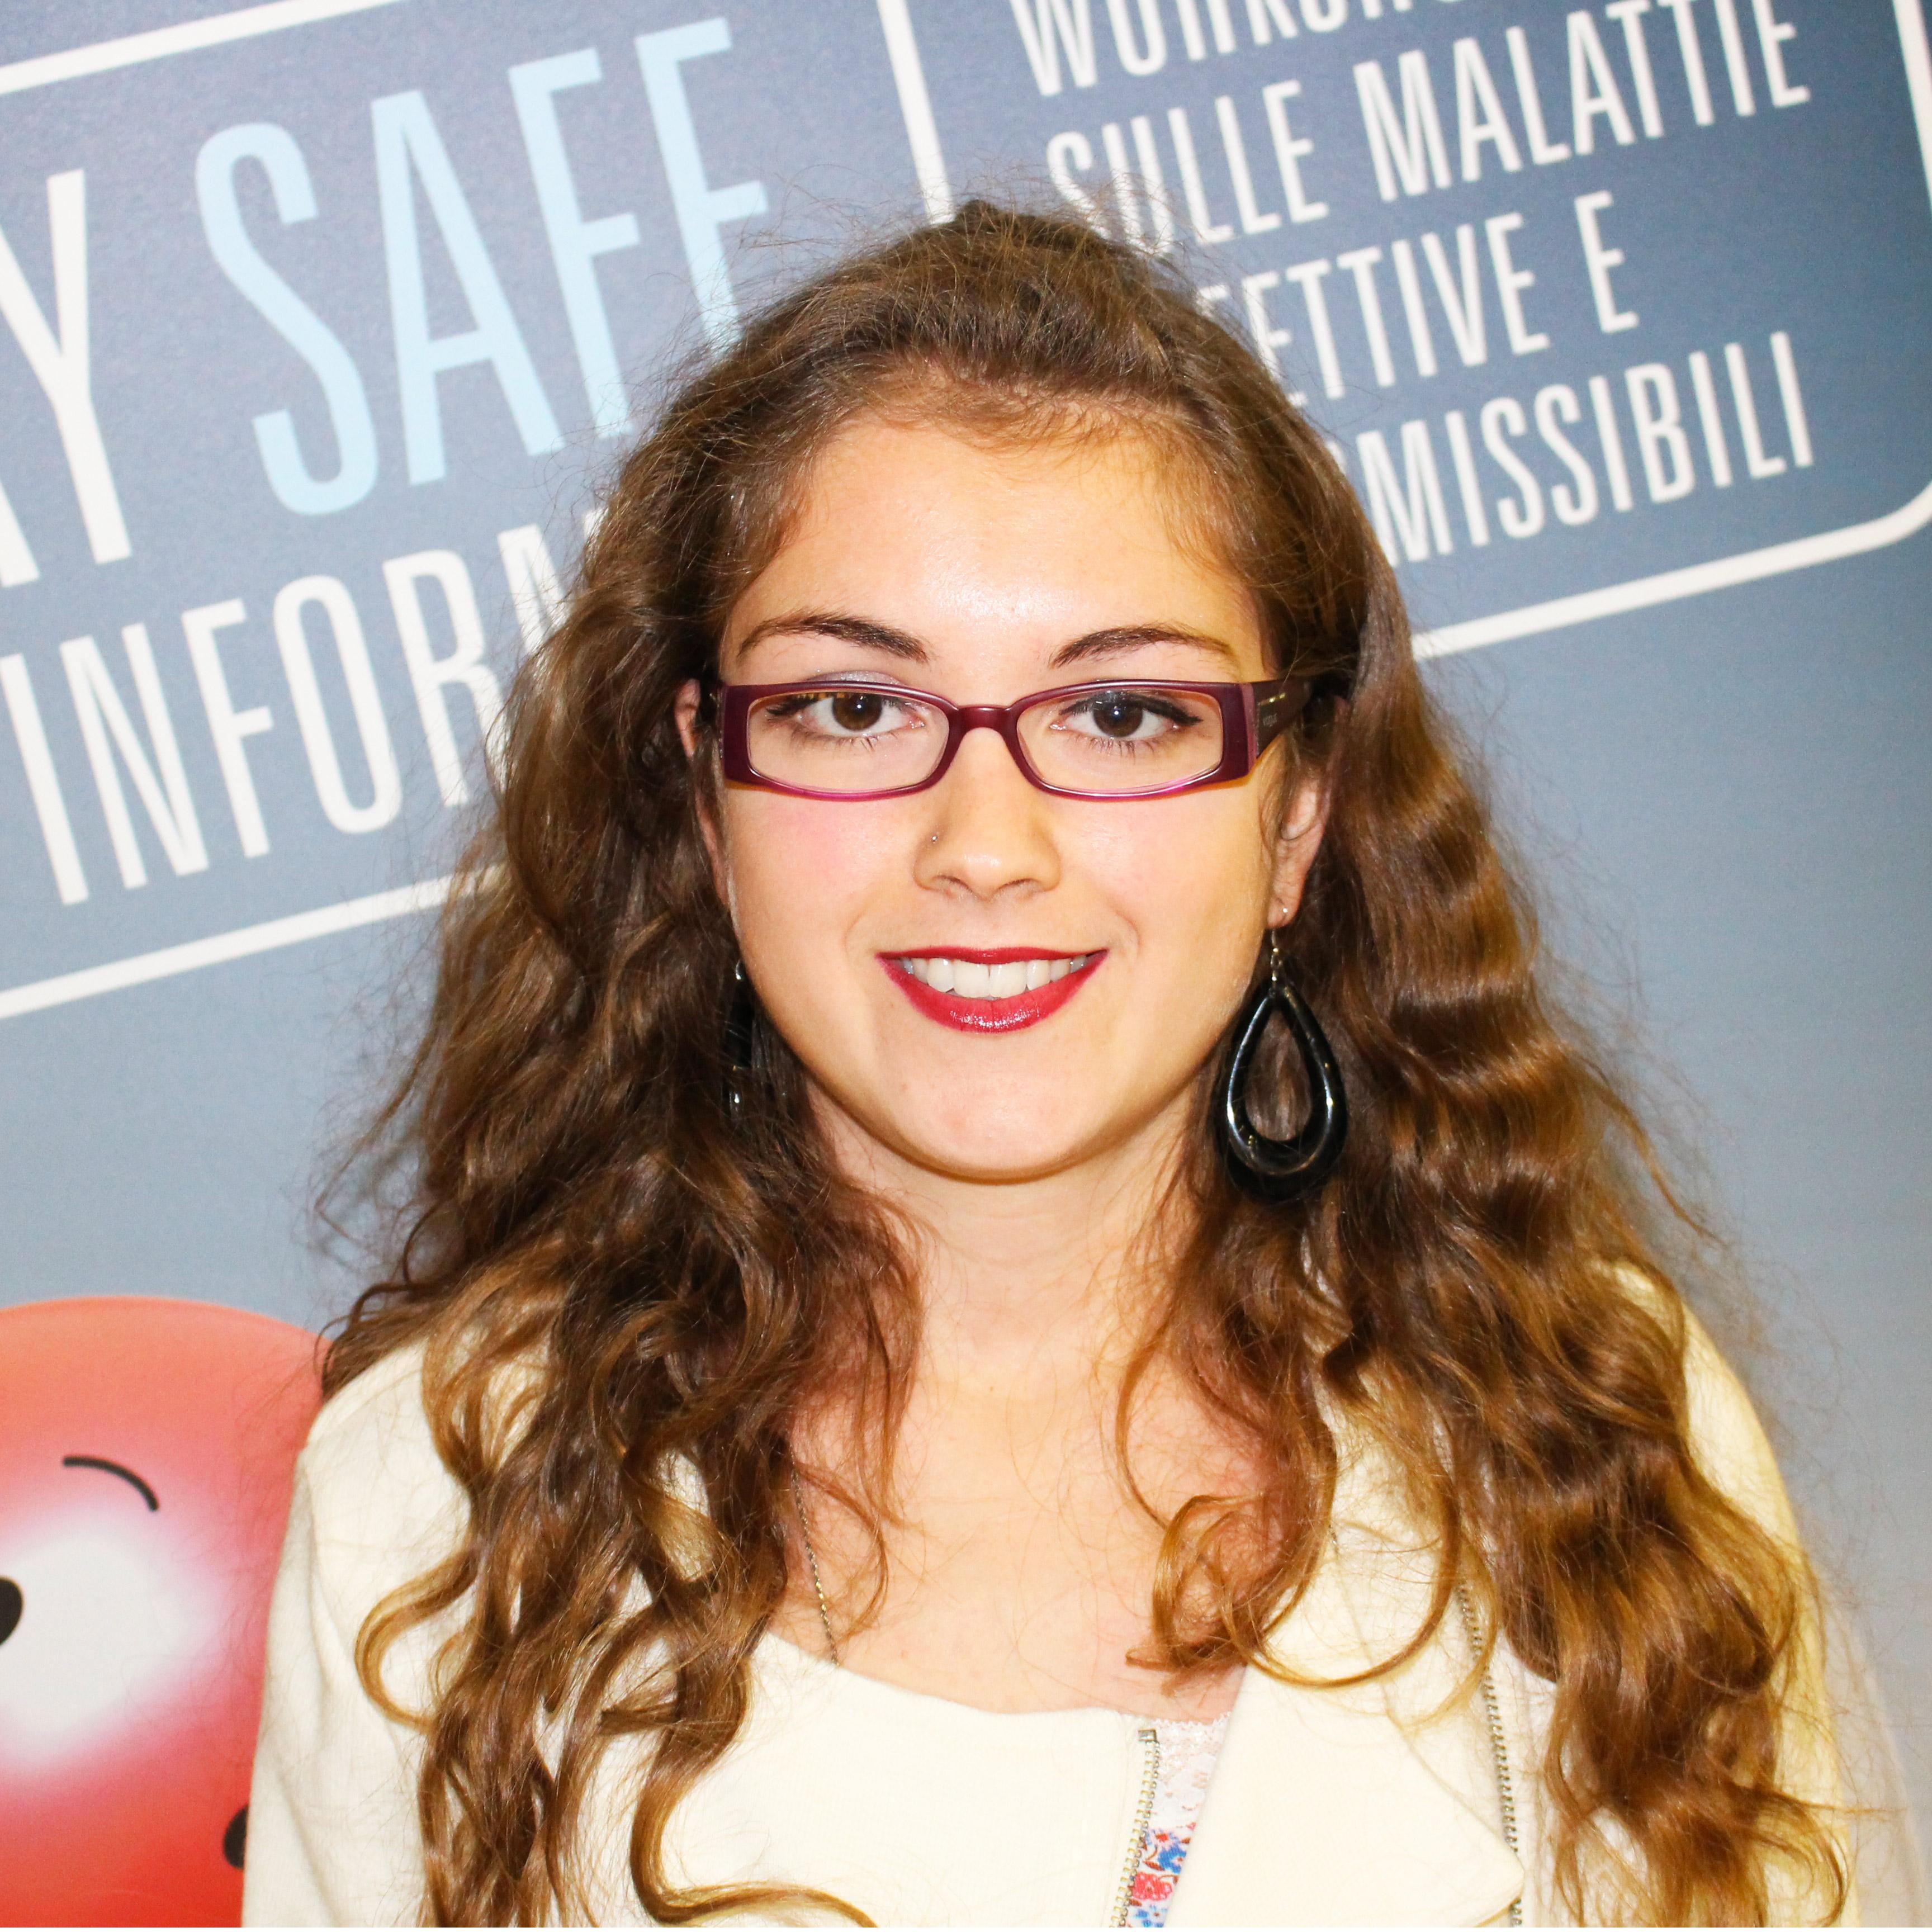 Sara Pesaro